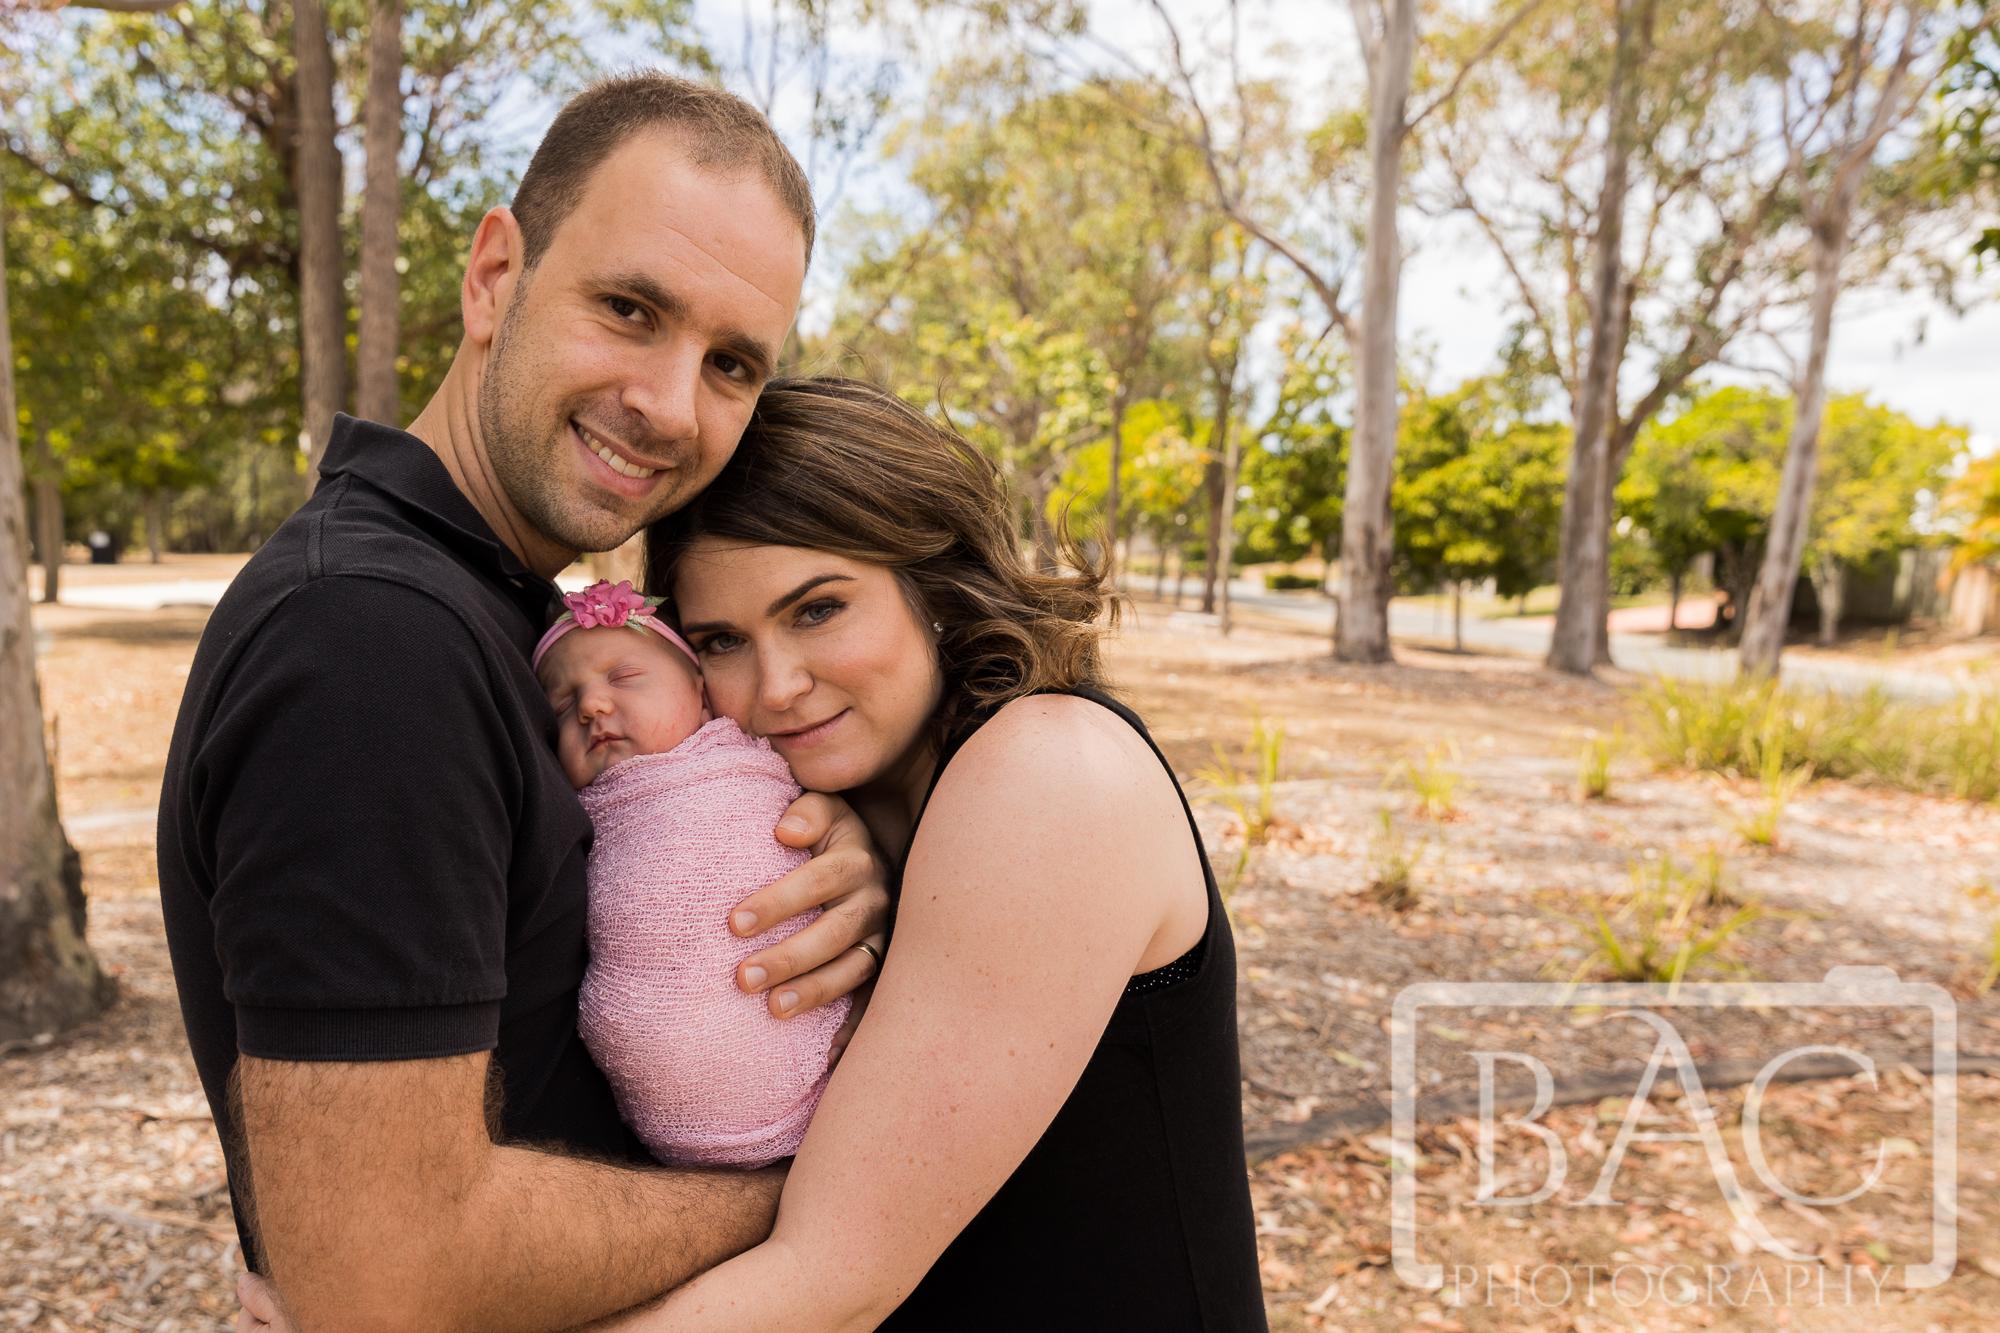 family newborn portrait in park